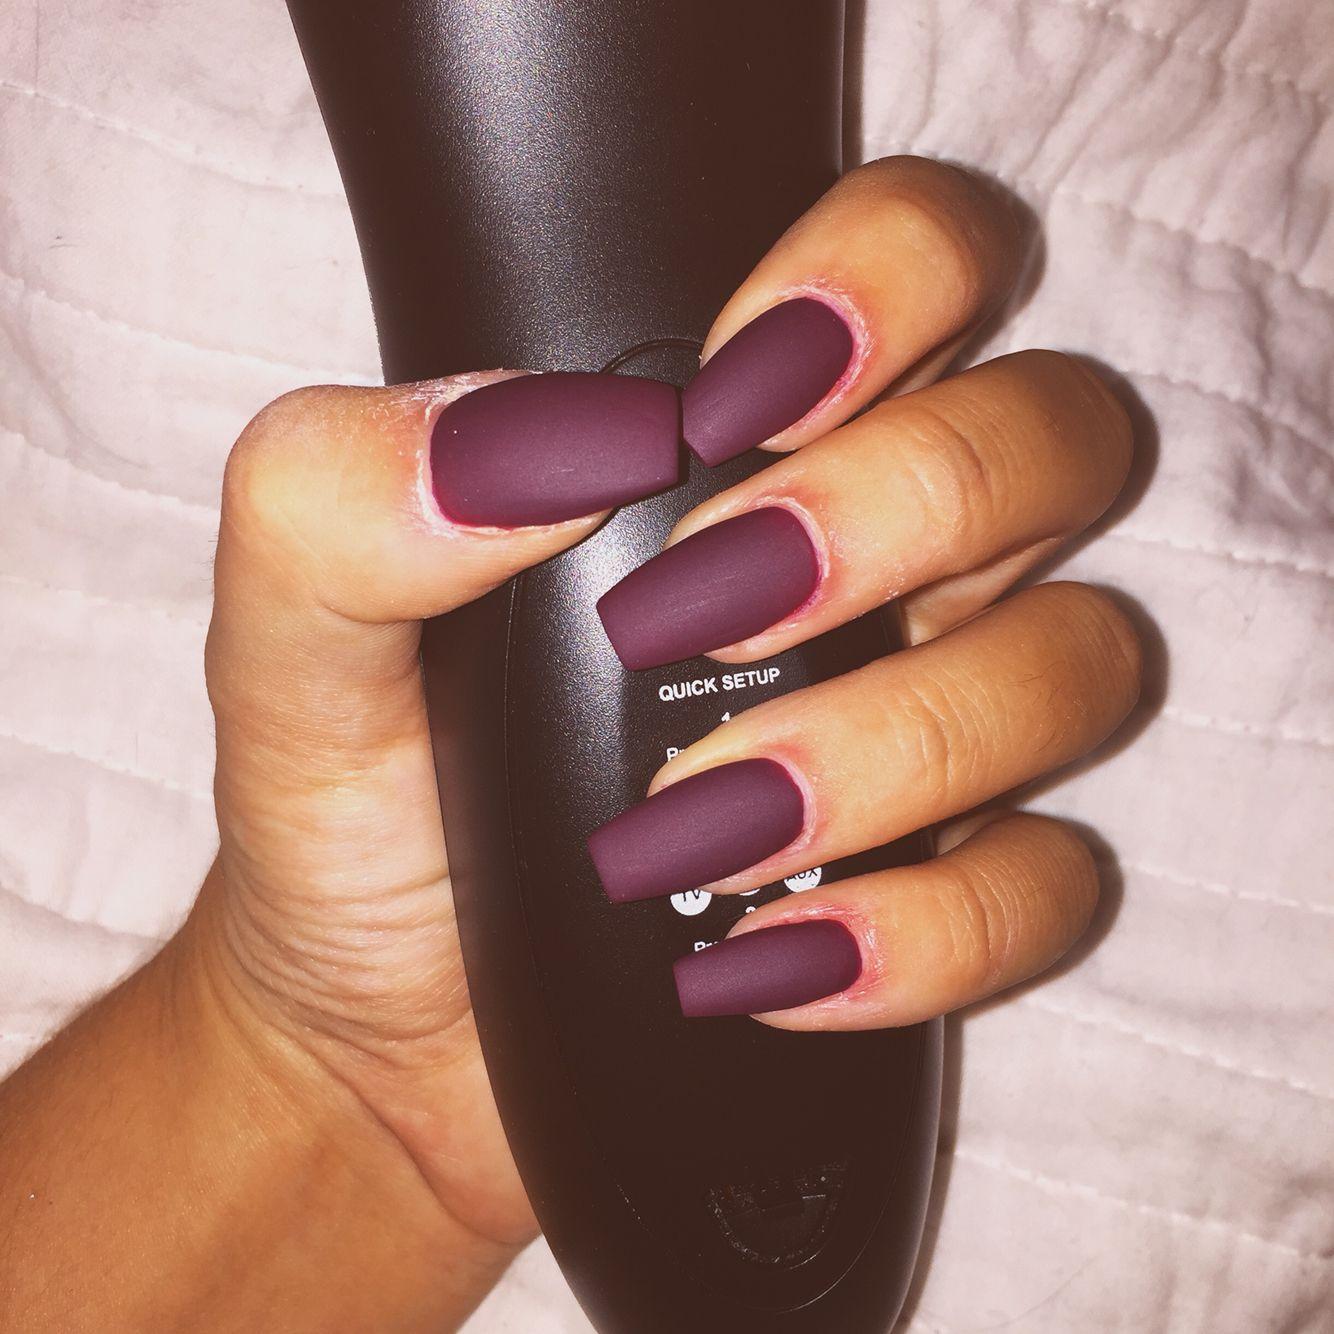 Matte, ballerina nails | Nails | Pinterest | Ballerina nails ...